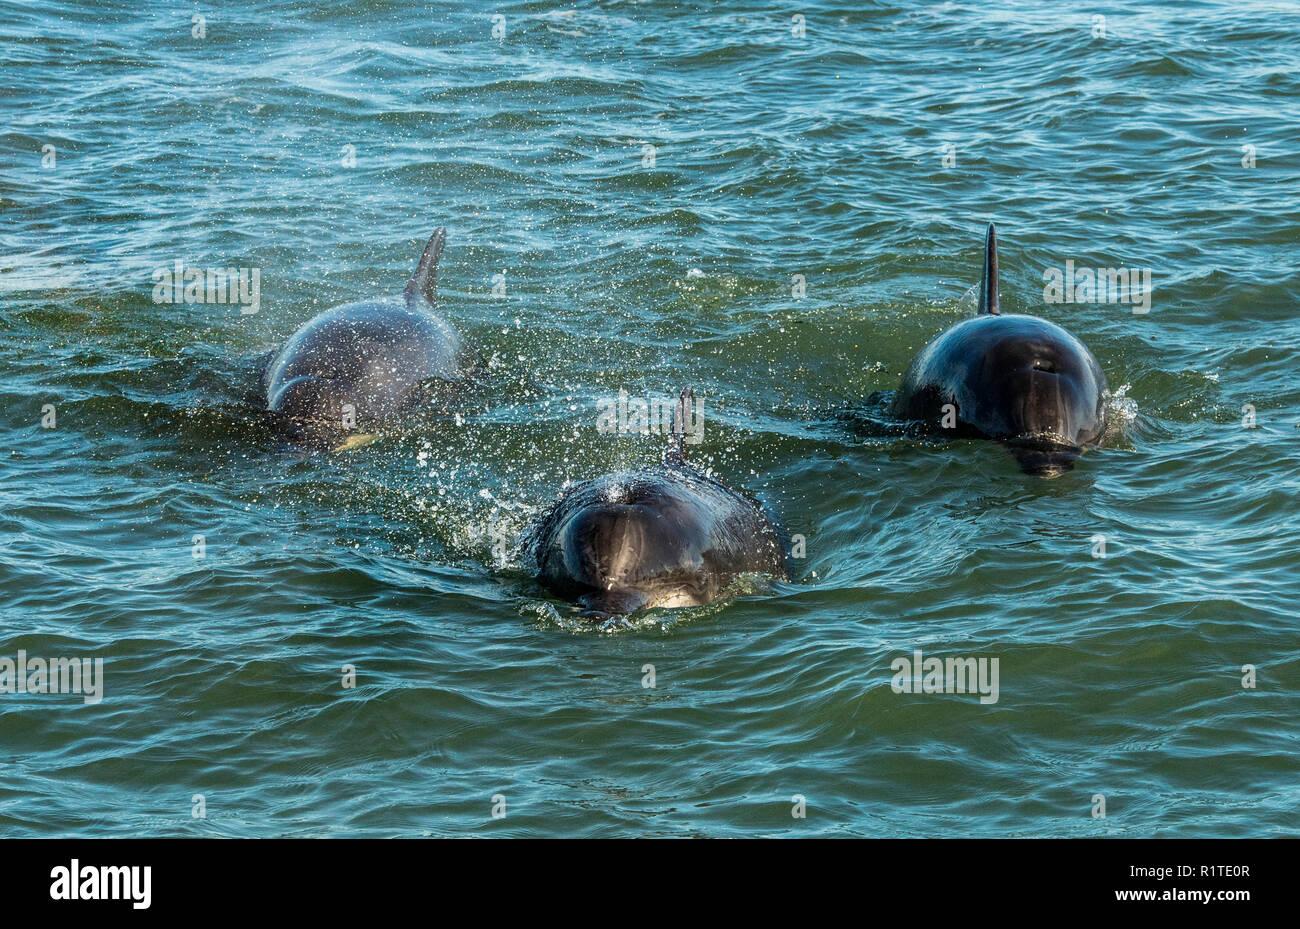 Aberdeen Bay Bottlenose Dolphins - Stock Image